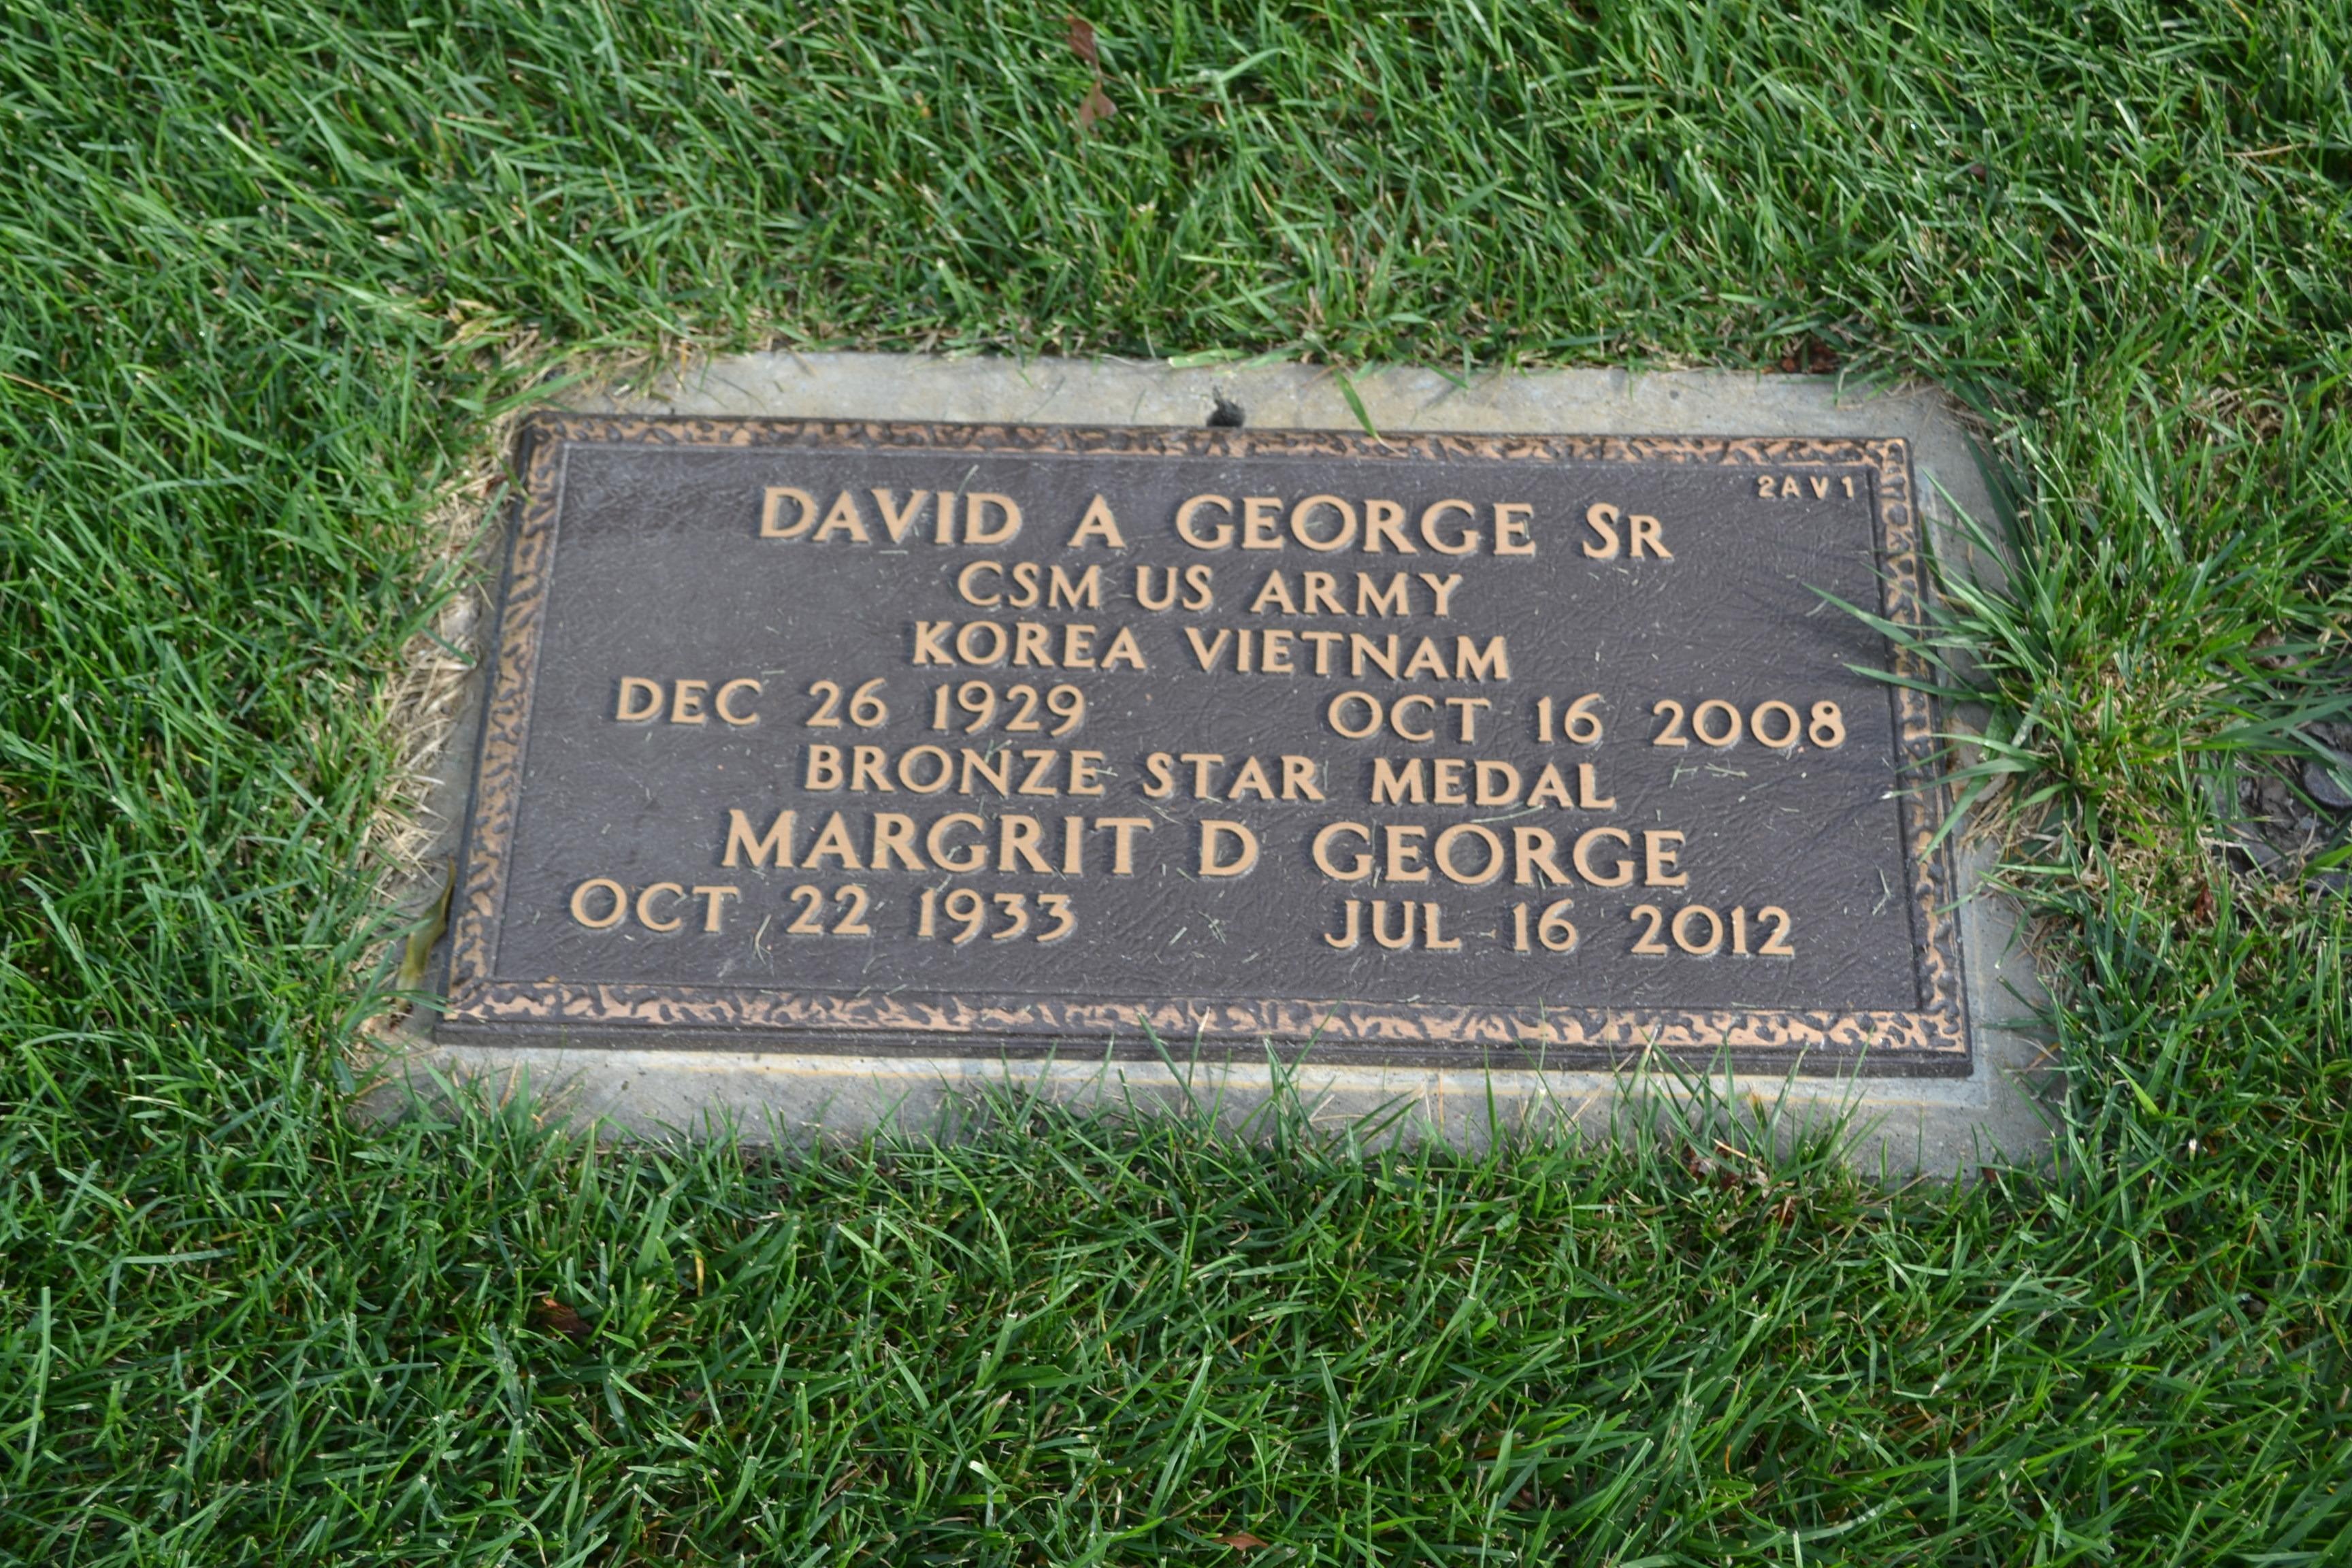 David Alexander George, Sr